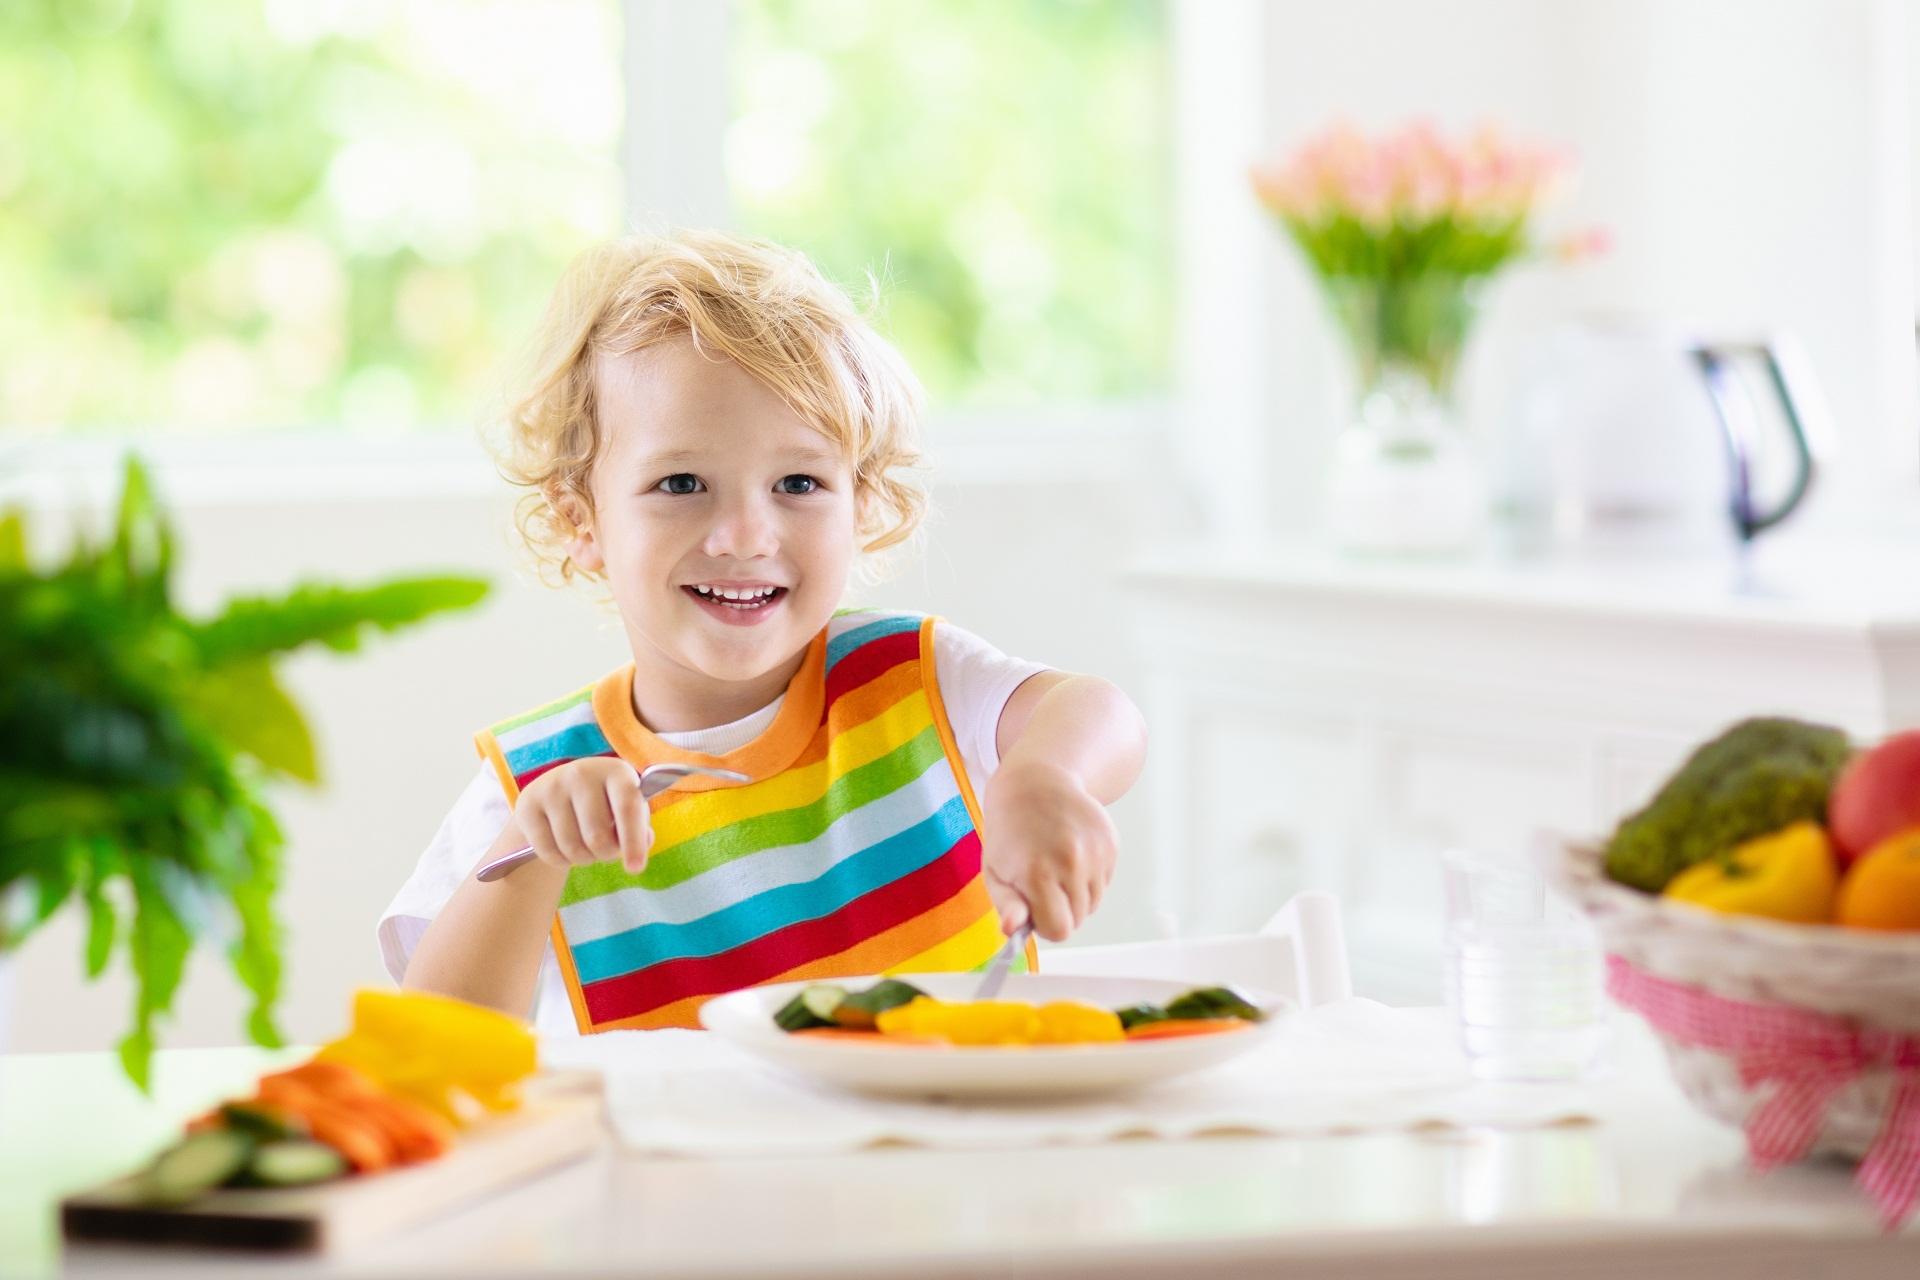 Fenilcetonuria aumento fenilalanina teste do pezinho alterado triagem neonatal dieta específica PKU divina dieta hiperfenilalaninemia